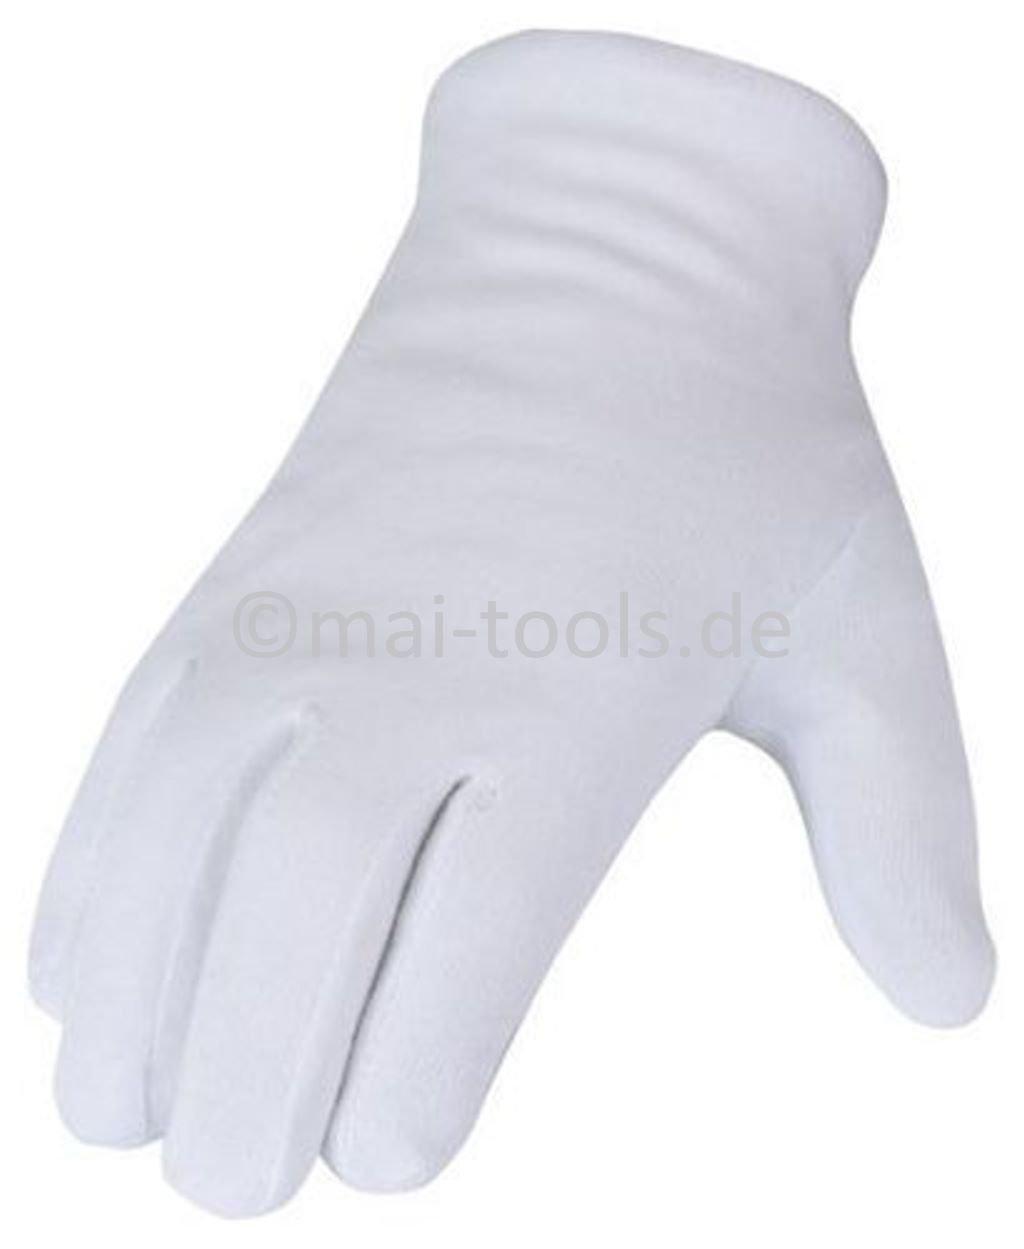 Baumwollhandschuhe weiß (wählbar Gr. 7 (S), 8 (M), 9 (L), 10 (XL), 11 (XXL), Spar-Pack: 1 Paar bis 300 Paar) (240, 10 / XL)